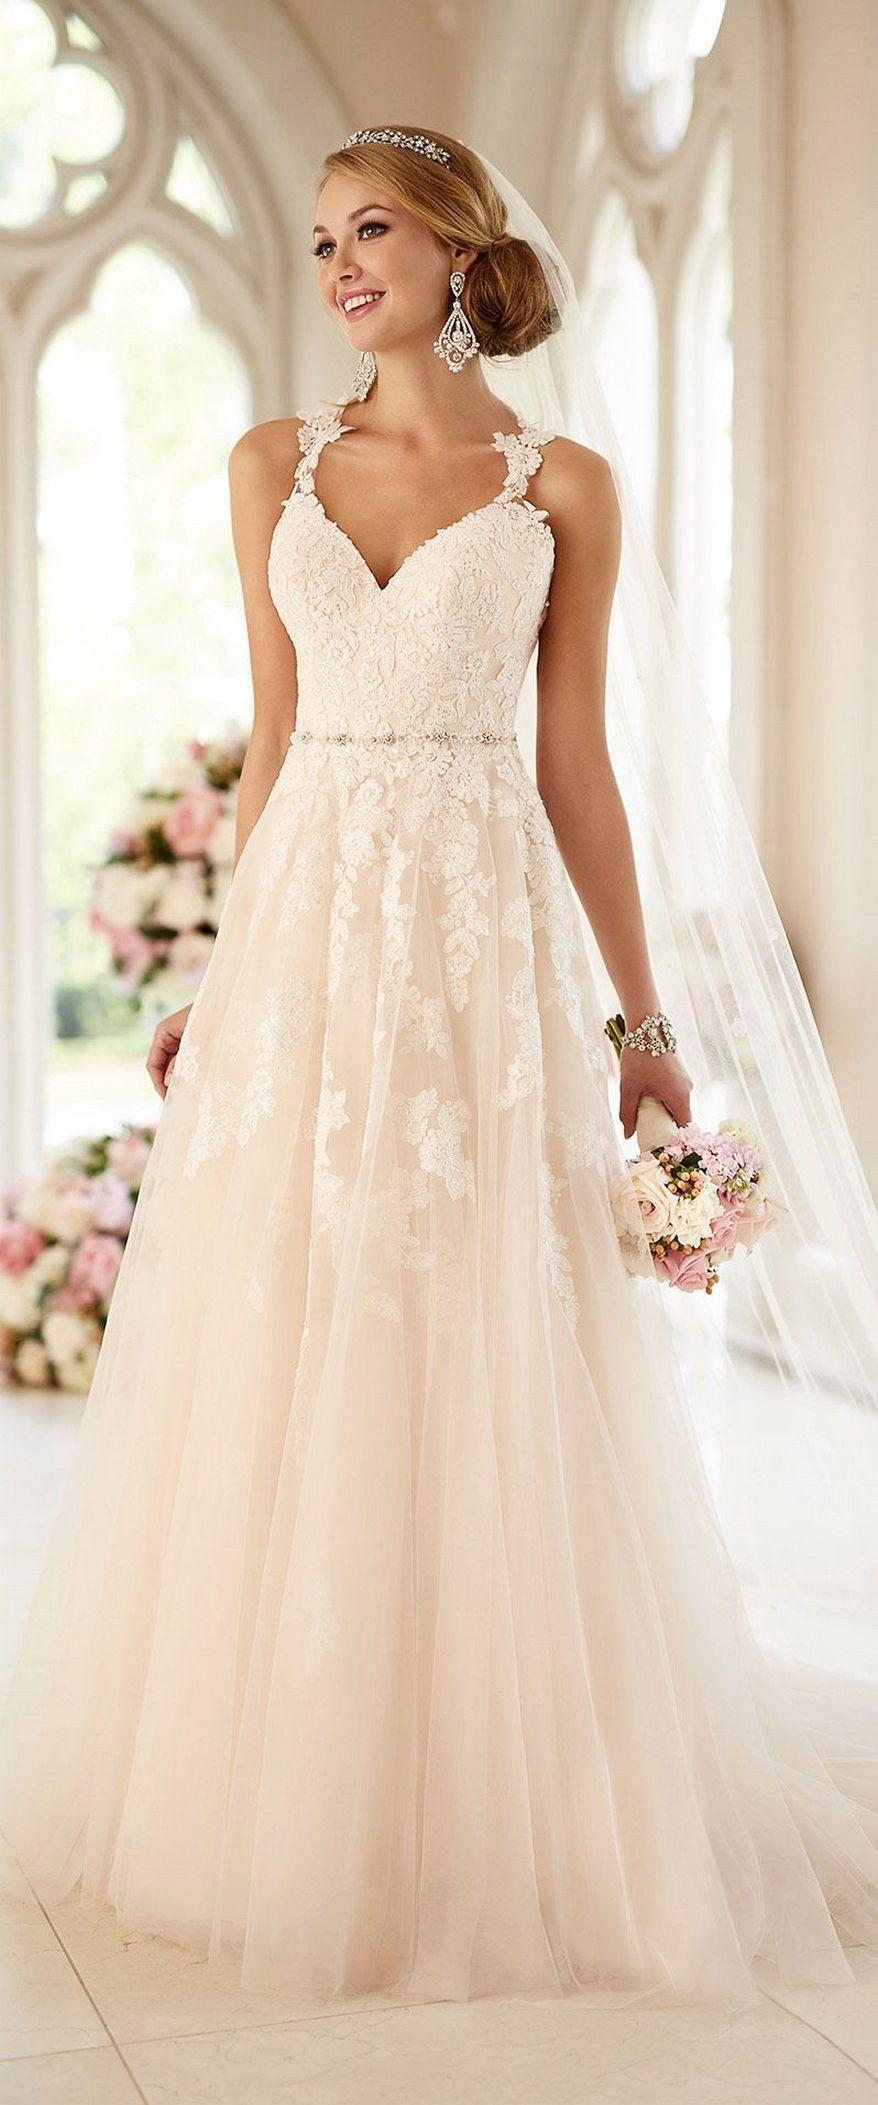 Beach dresses for weddings   Beautiful Beach Wedding Dresses to Inspire You  Beach weddings